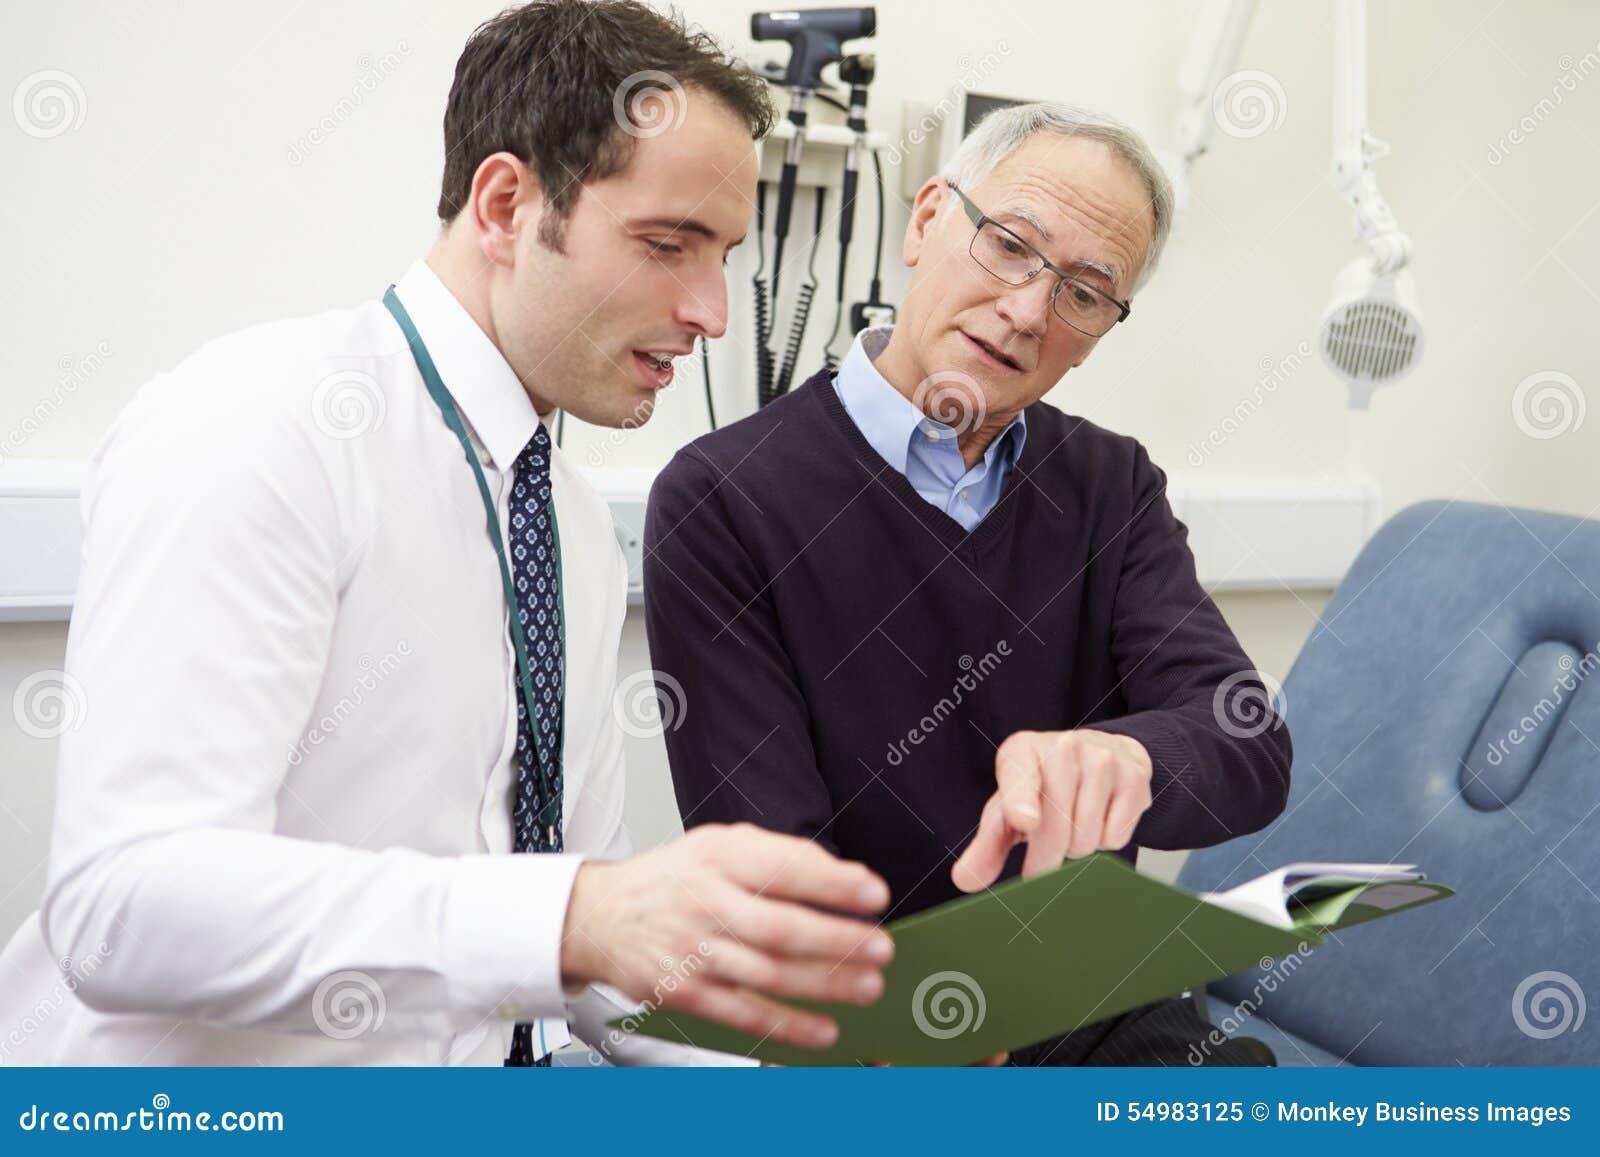 Consultor Discussing Test Results con el paciente